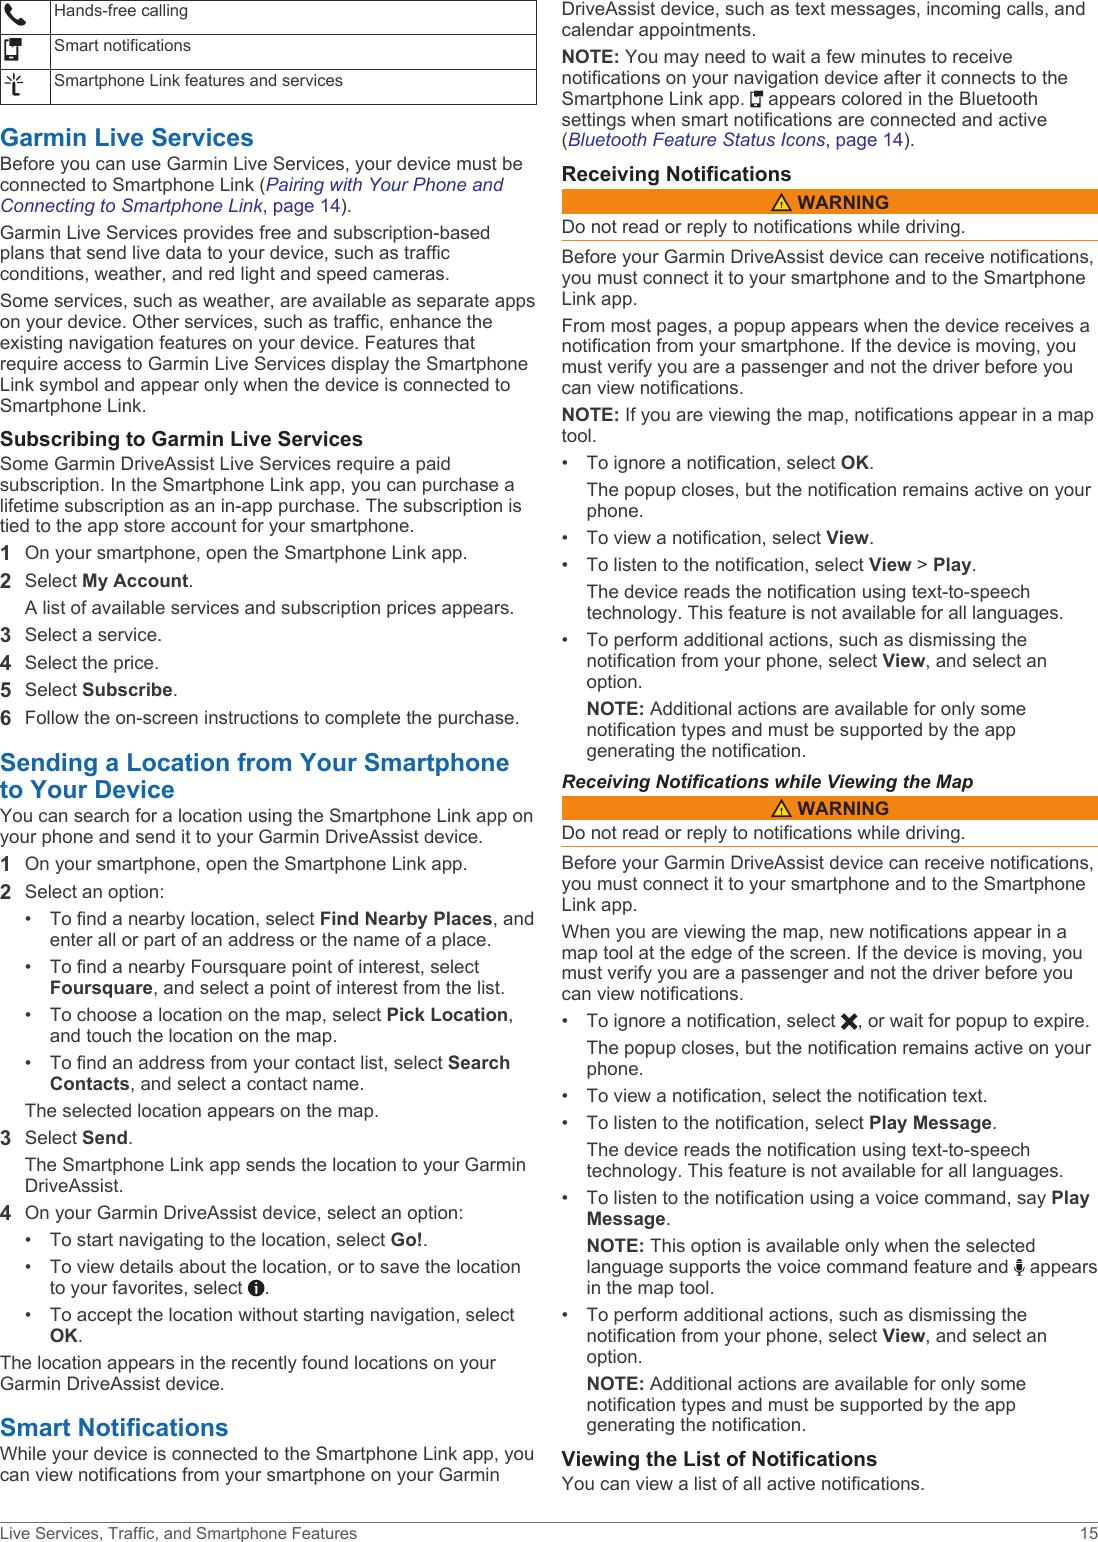 Garmin Drive Assist 51 Owner's Manual OM EN